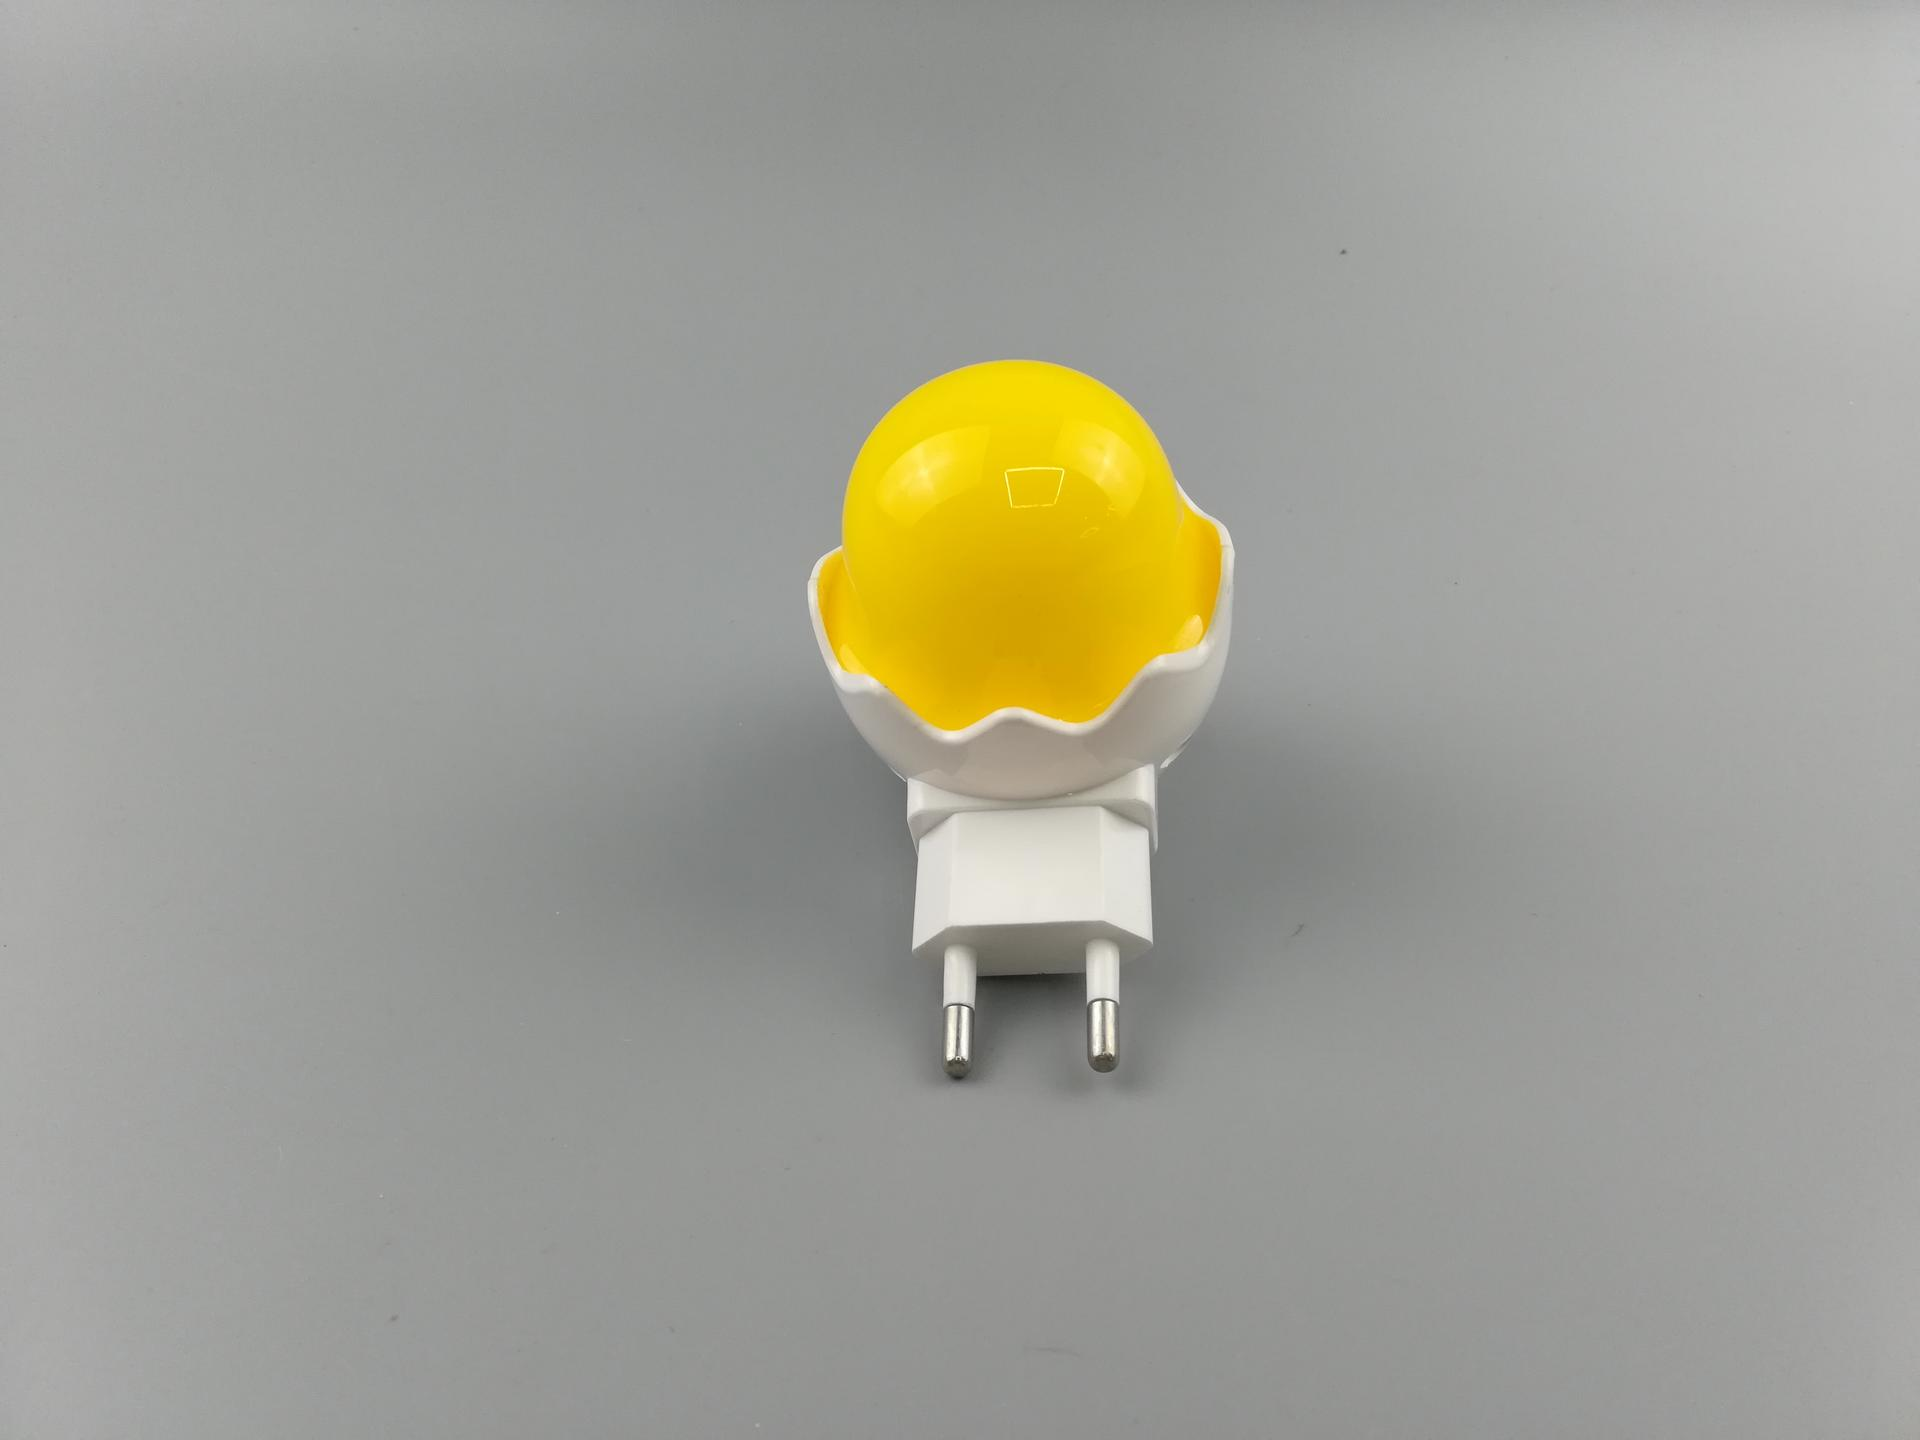 OEM Children's Bedroom Creative Cartoon Decor Lamp EU W032 Popular Nightlight Cute Mini Yellow Duck plug in lighting